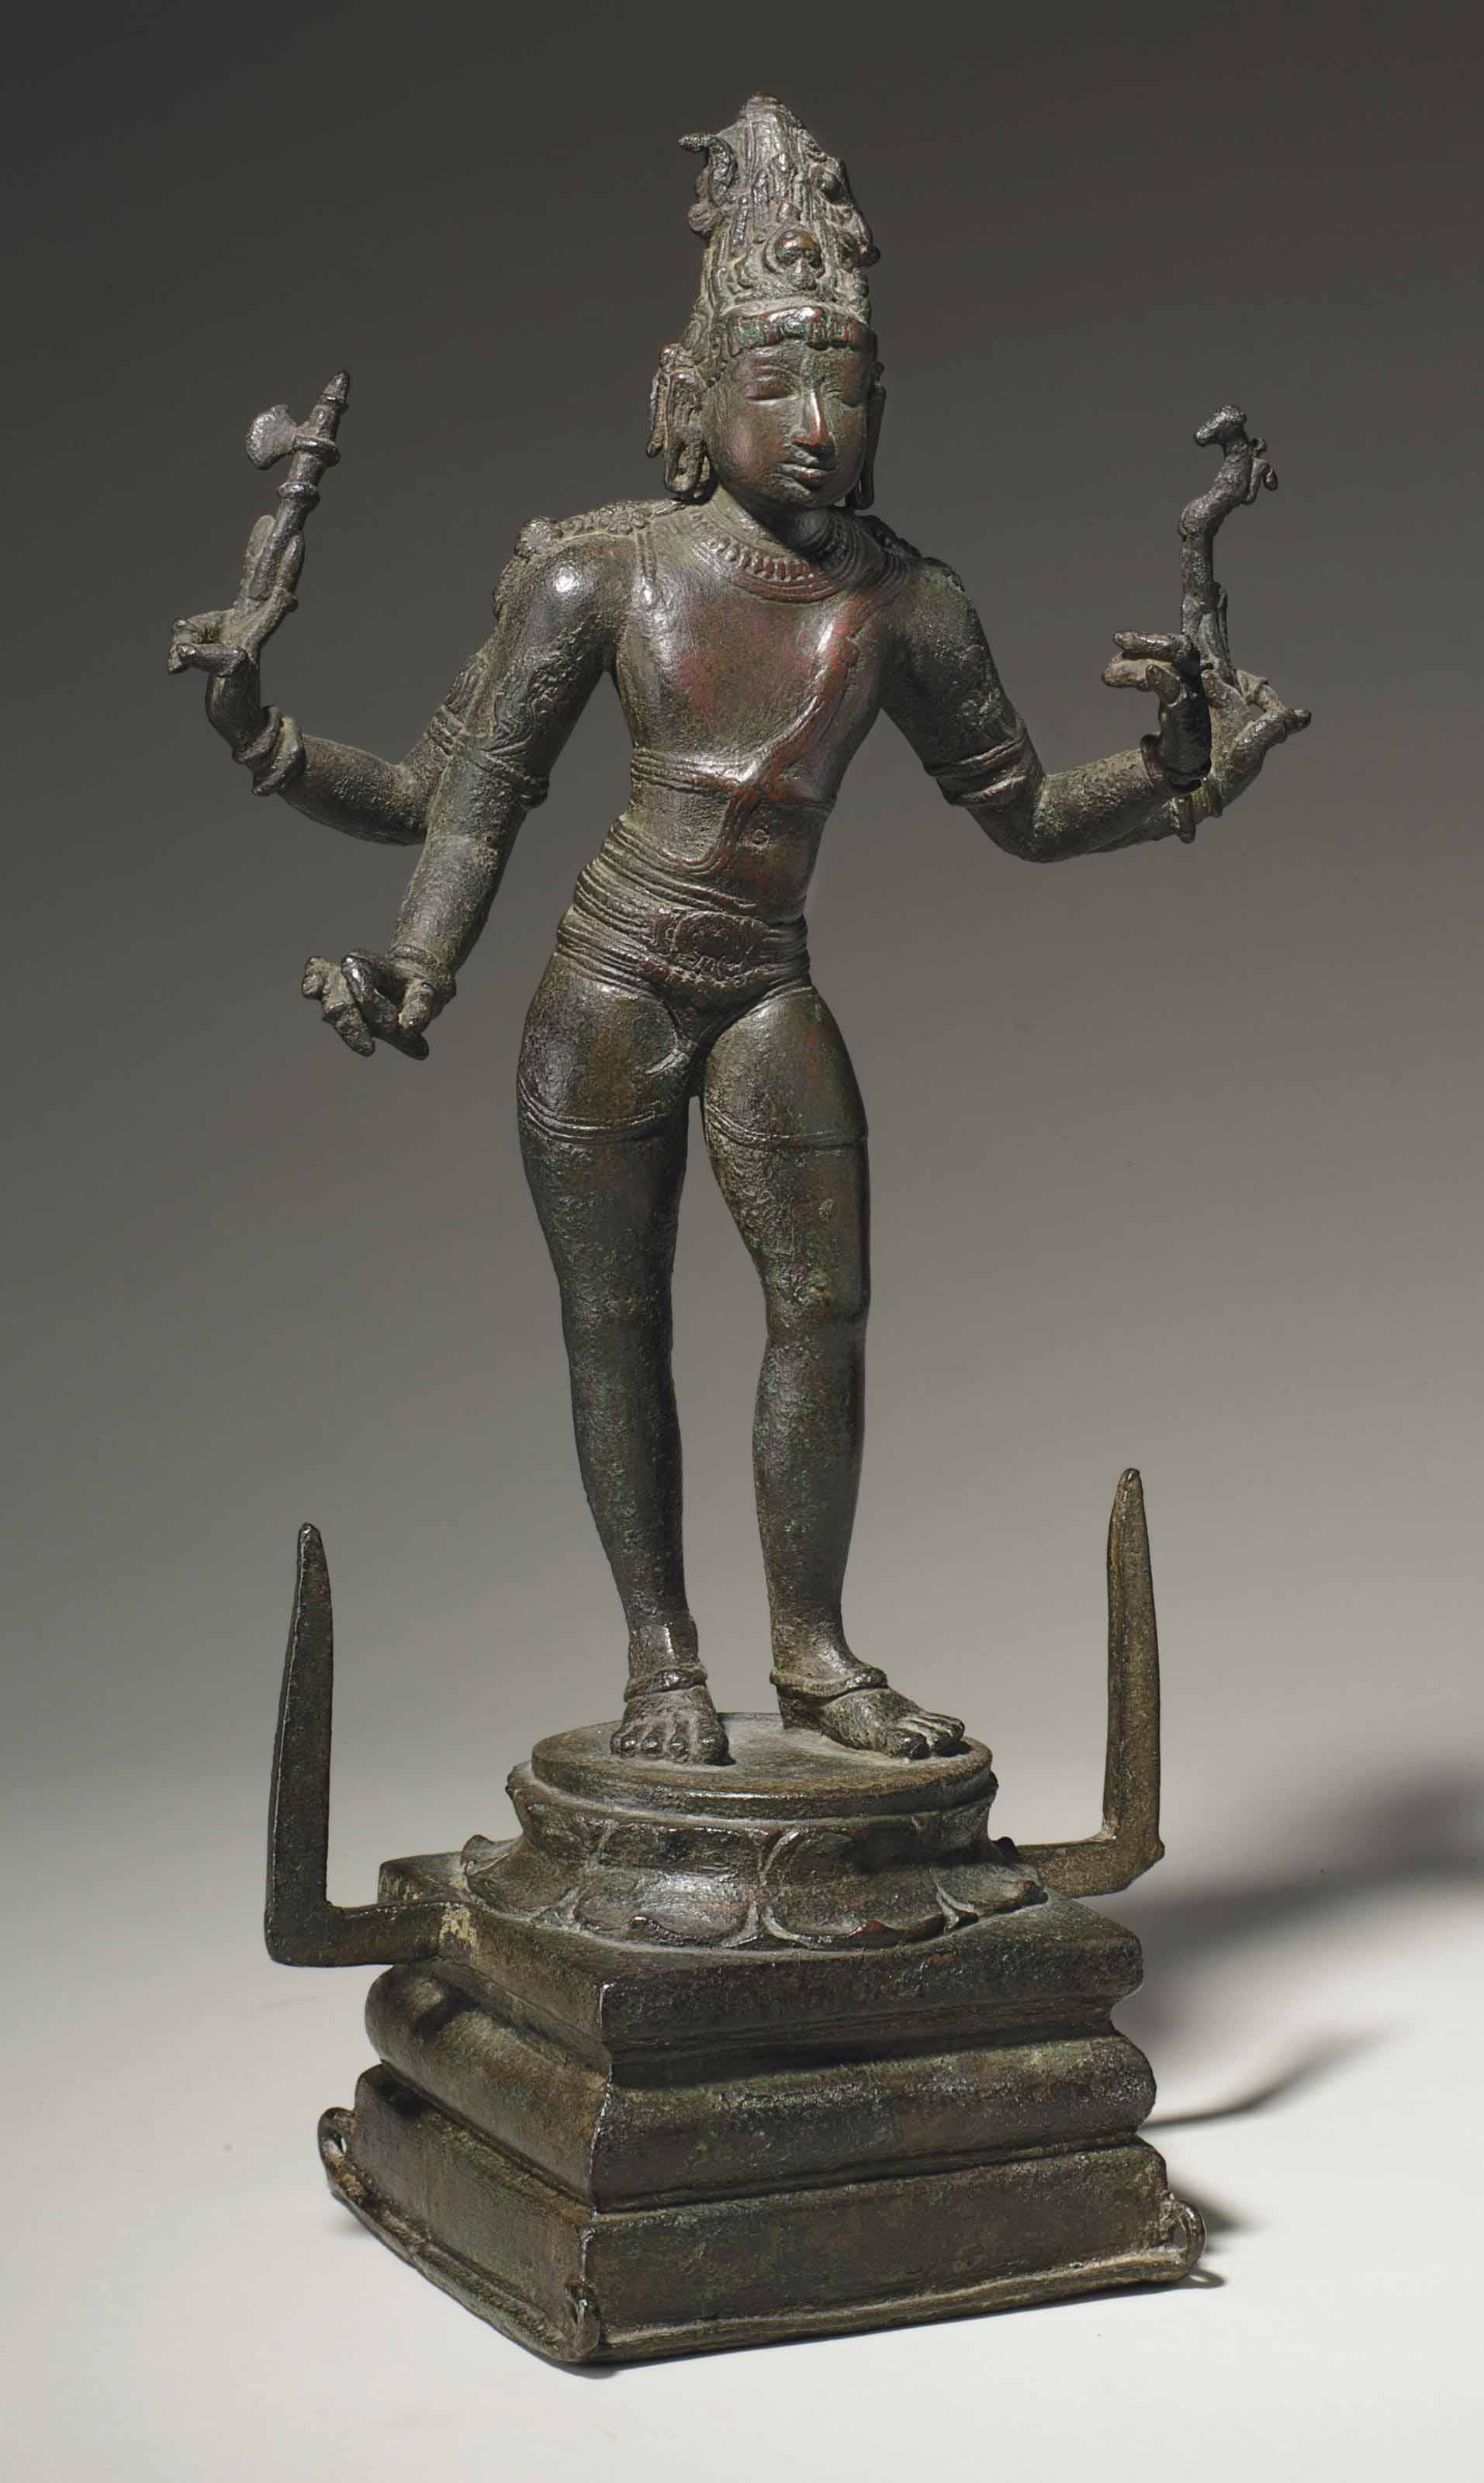 A bronze figure of Shiva Vinadhara Dakshinamurti | SOUTH INDIA, CHOLA  PERIOD, LAST QUARTER 10TH CENTURY FIRST QUARTER 11TH CENTURY | Sculptures,  Statues & Figures, figure | Christie's